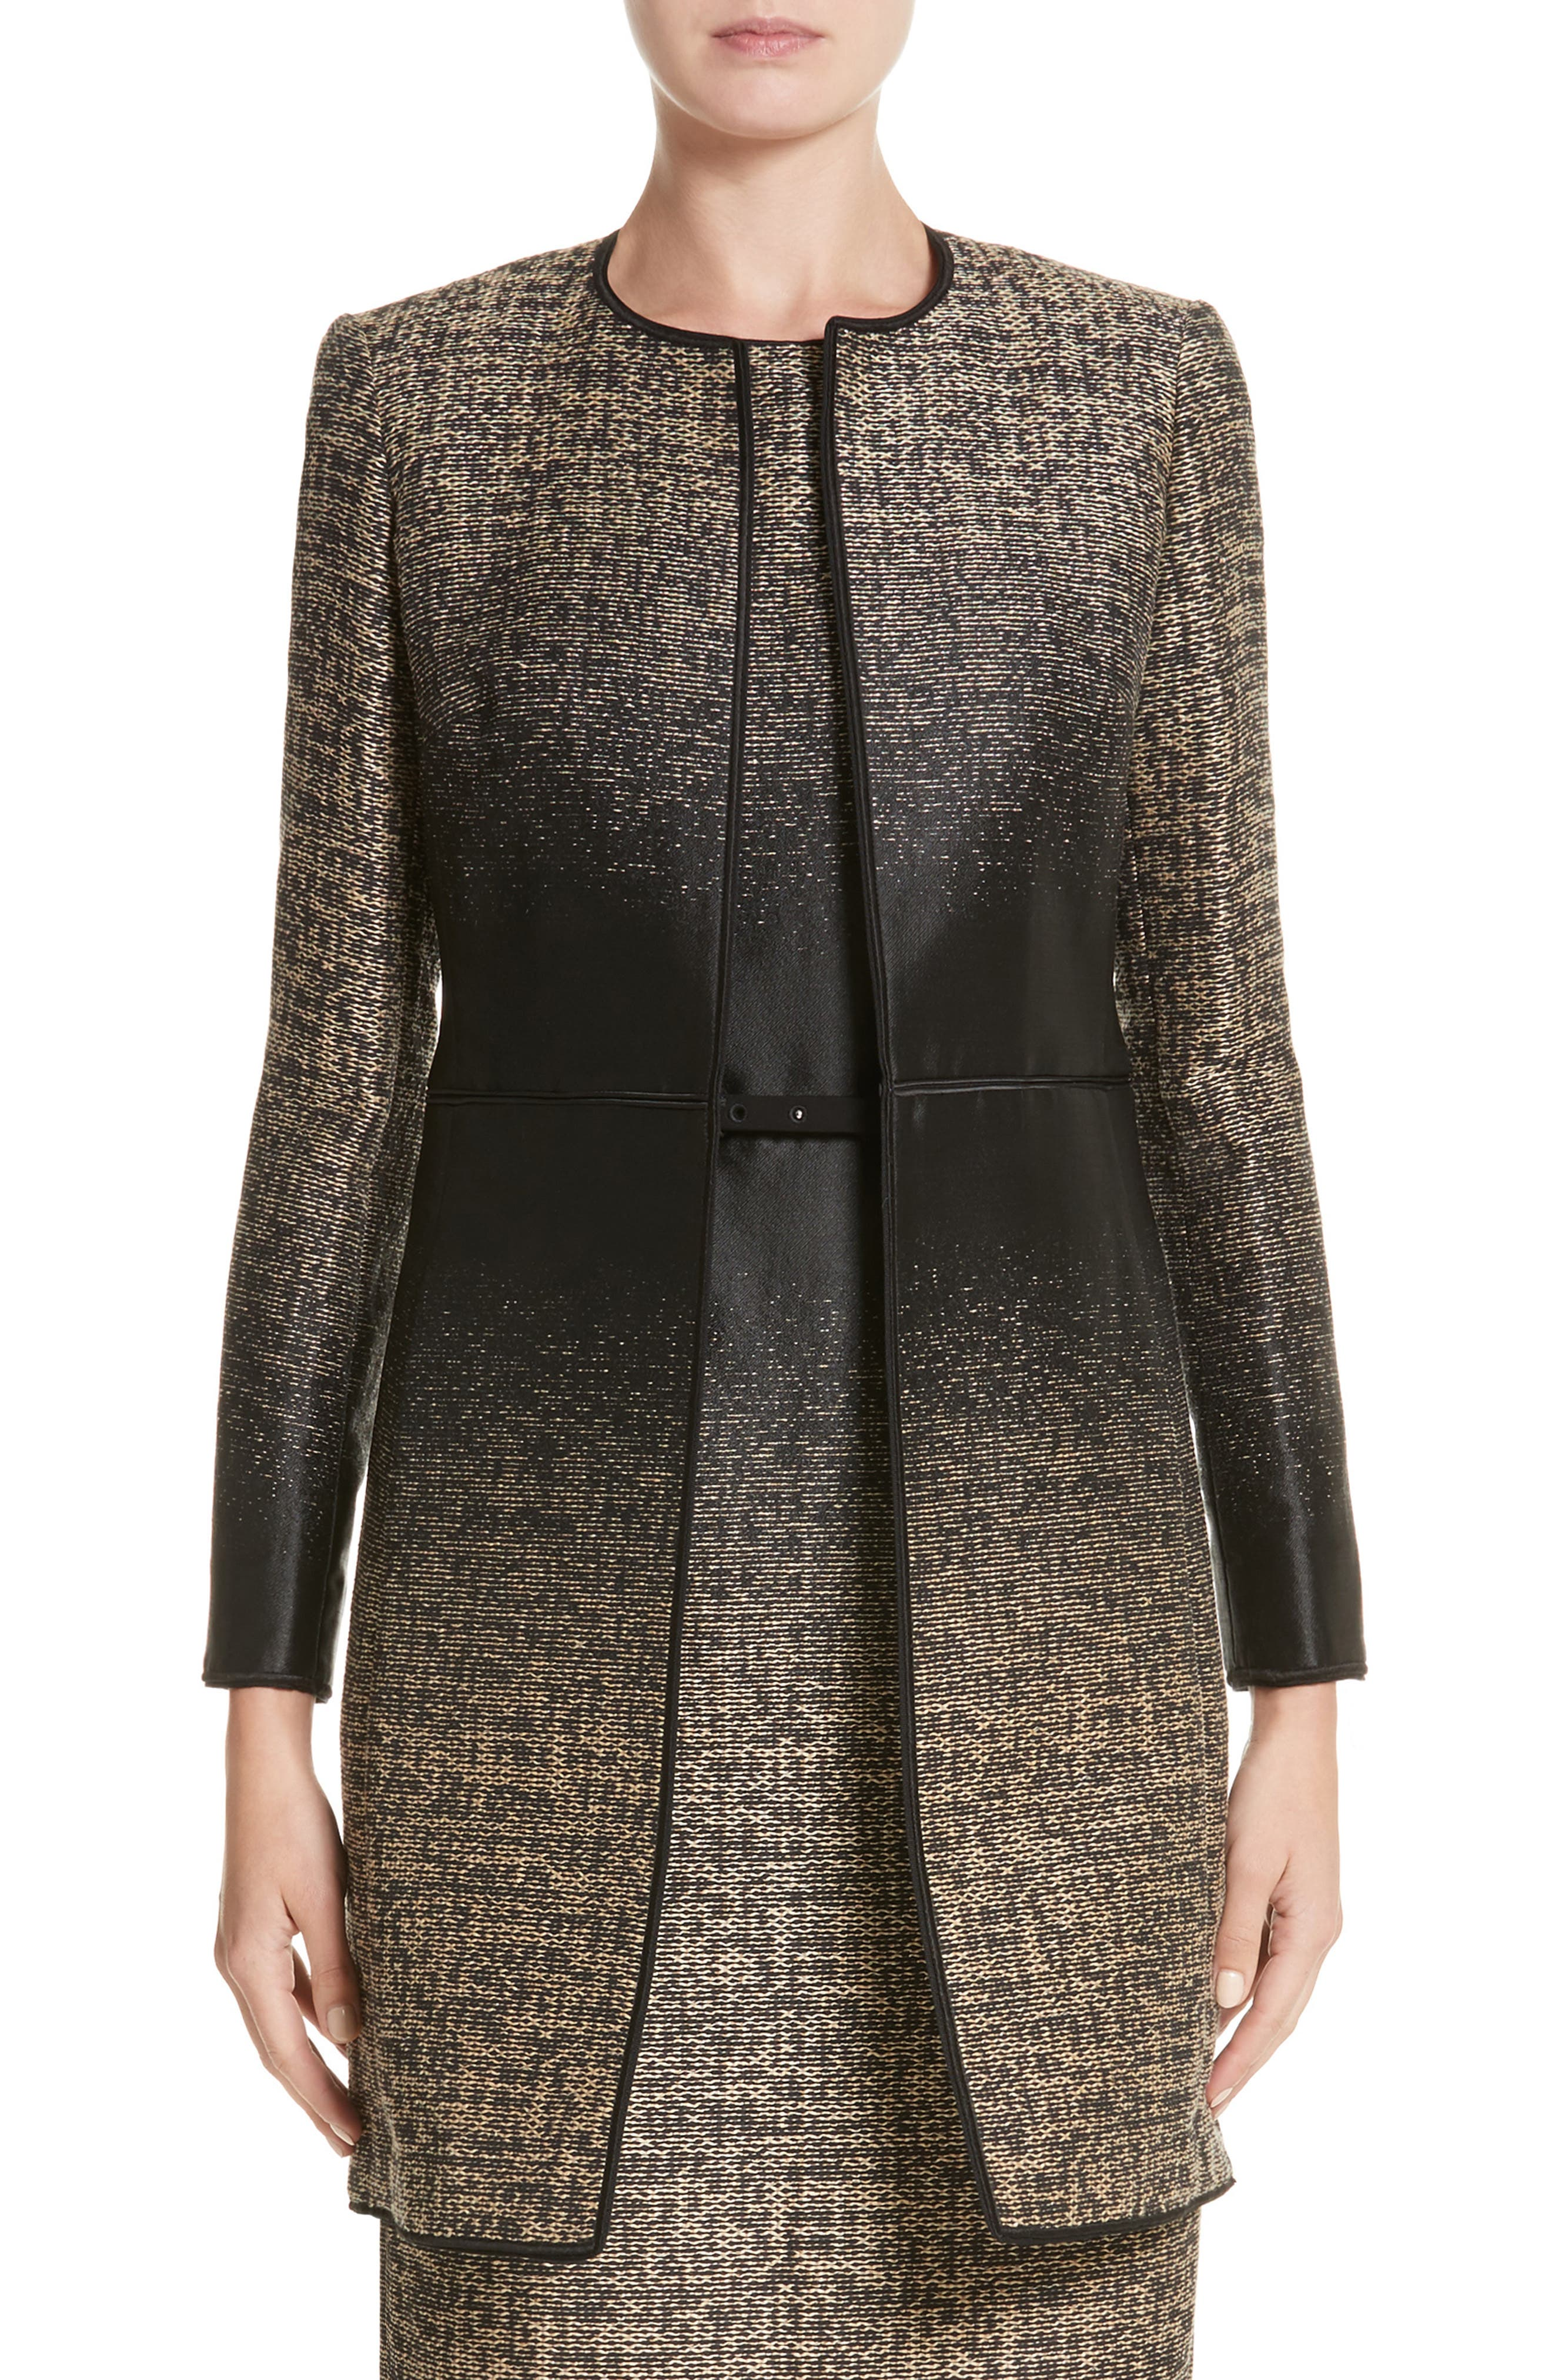 Erin Jacquard Jacket,                         Main,                         color, Black Multi